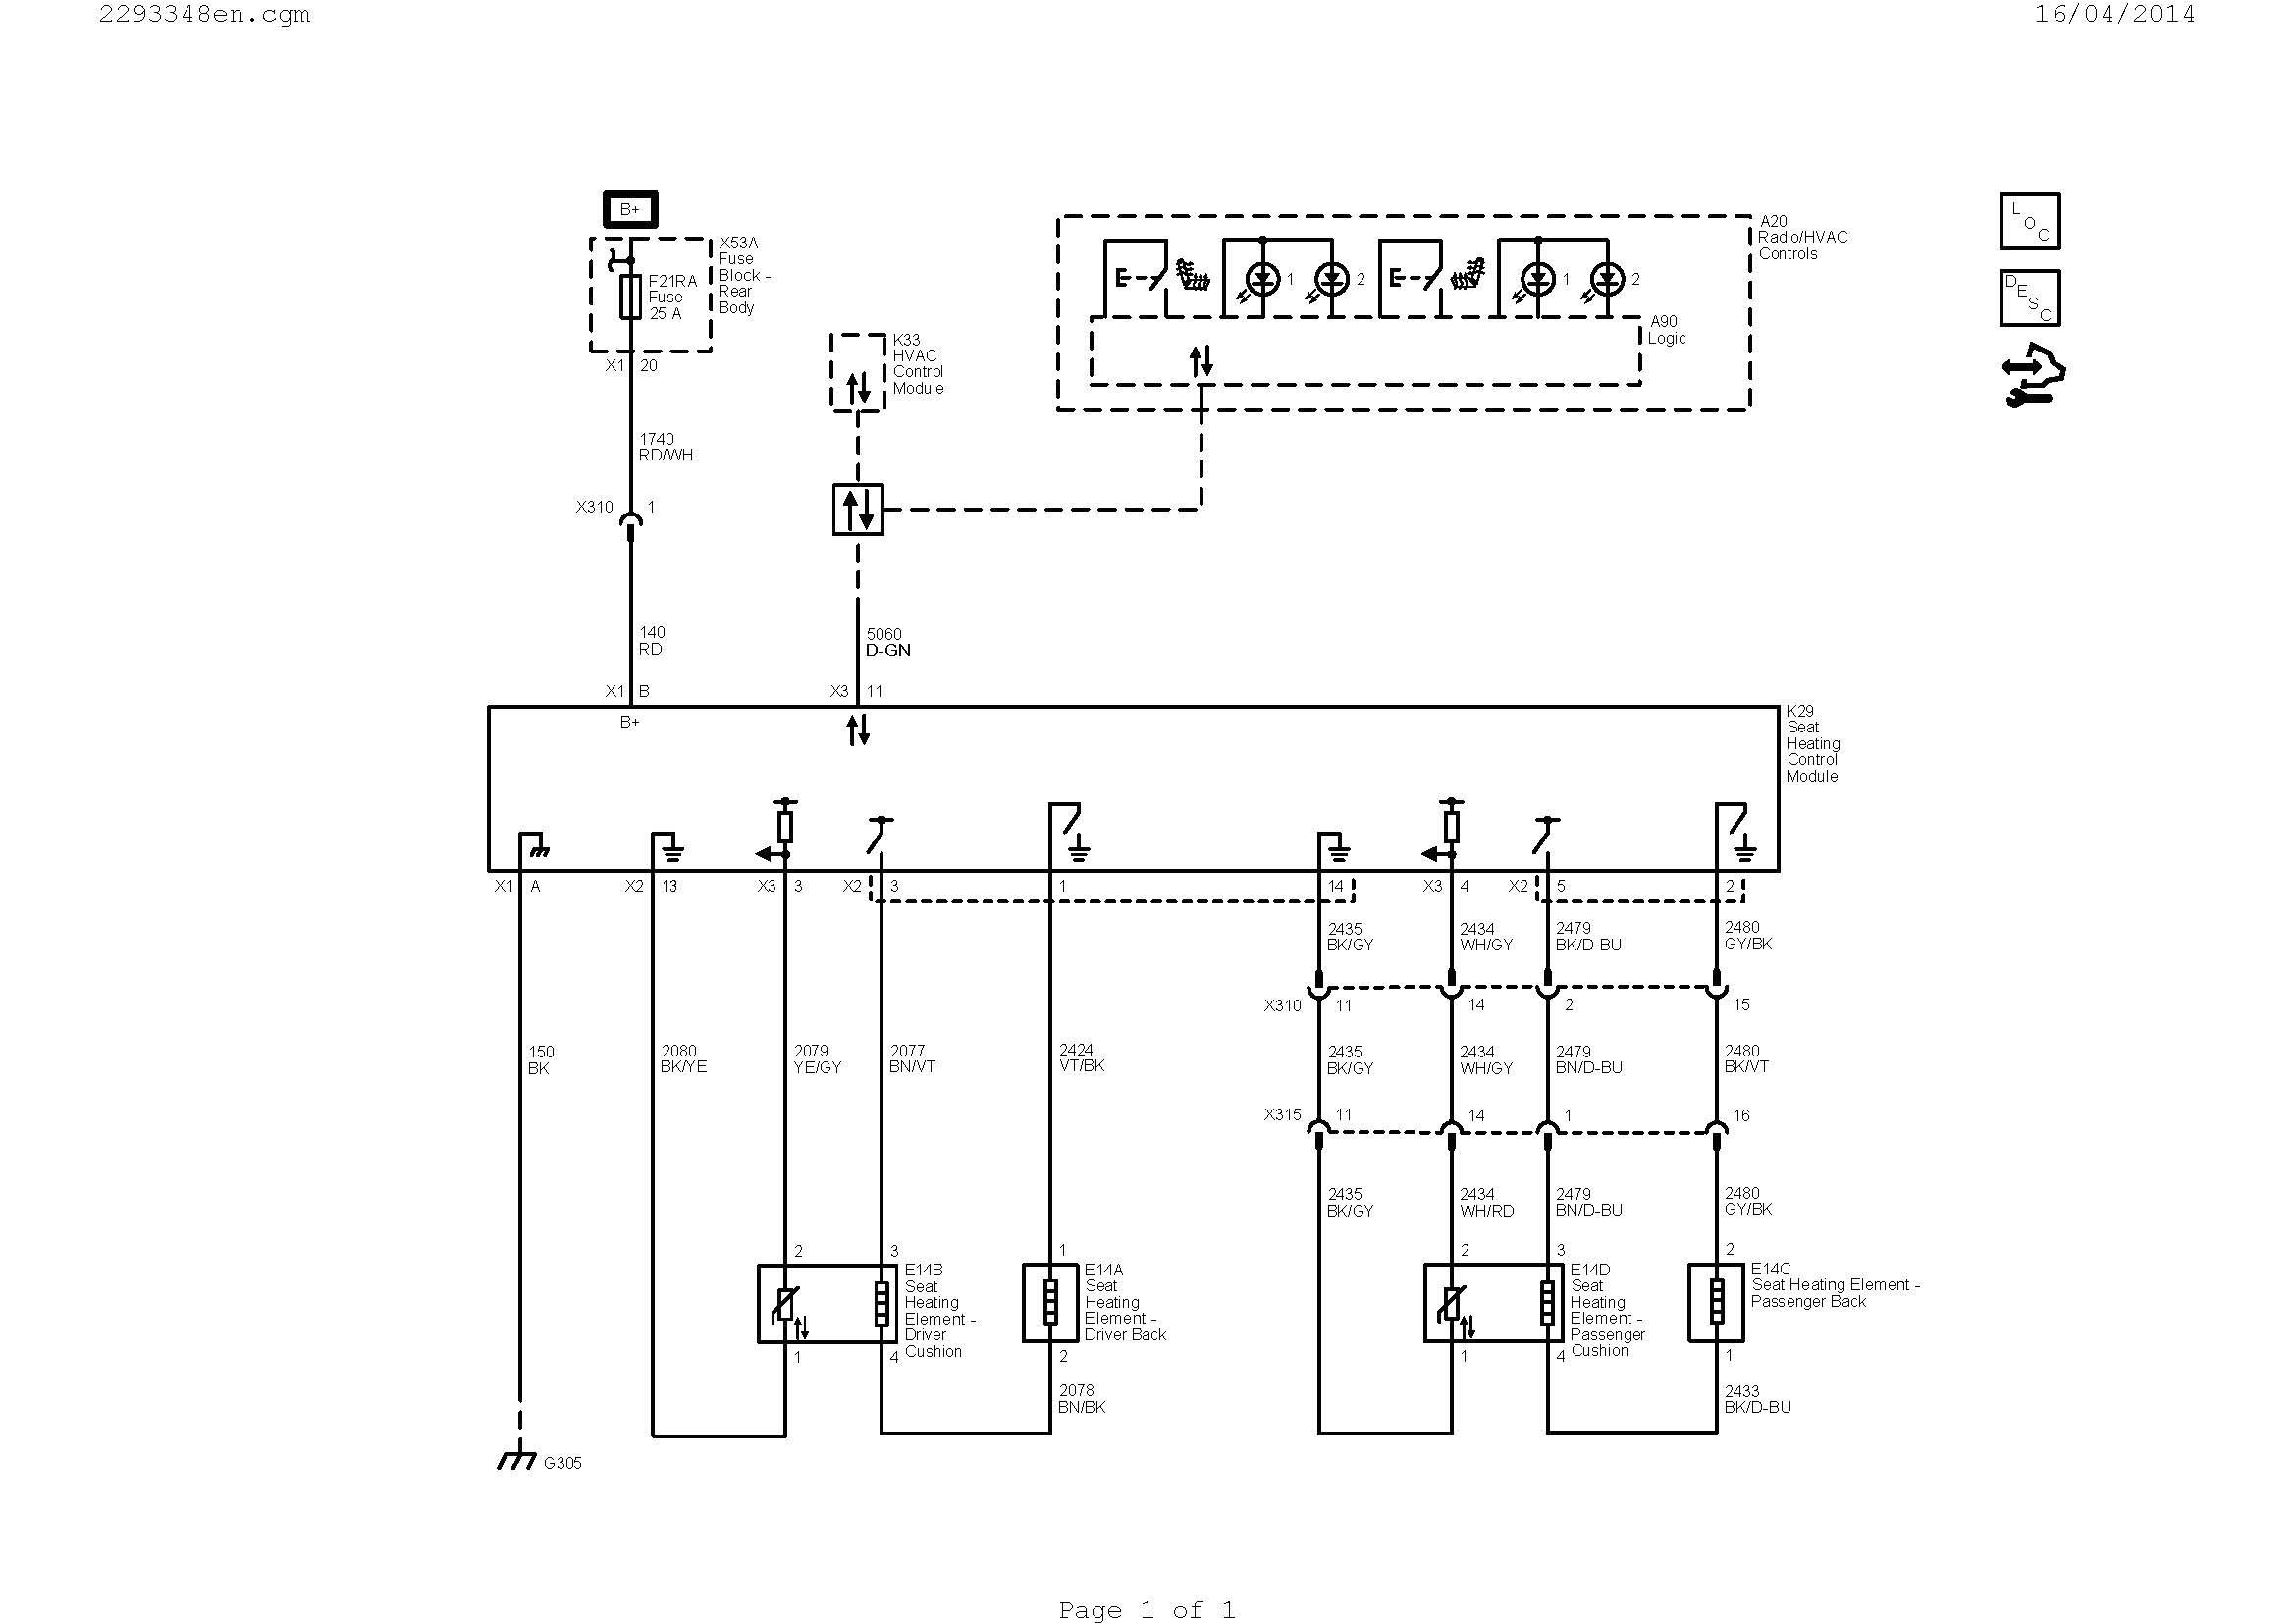 simple light switch wiring diagram ac tech wiring diagram new diagram websites unique hvac diagram 0d rh rccarsusa light switch wiring diagram vehicle wiring diagram websites 2h jpg